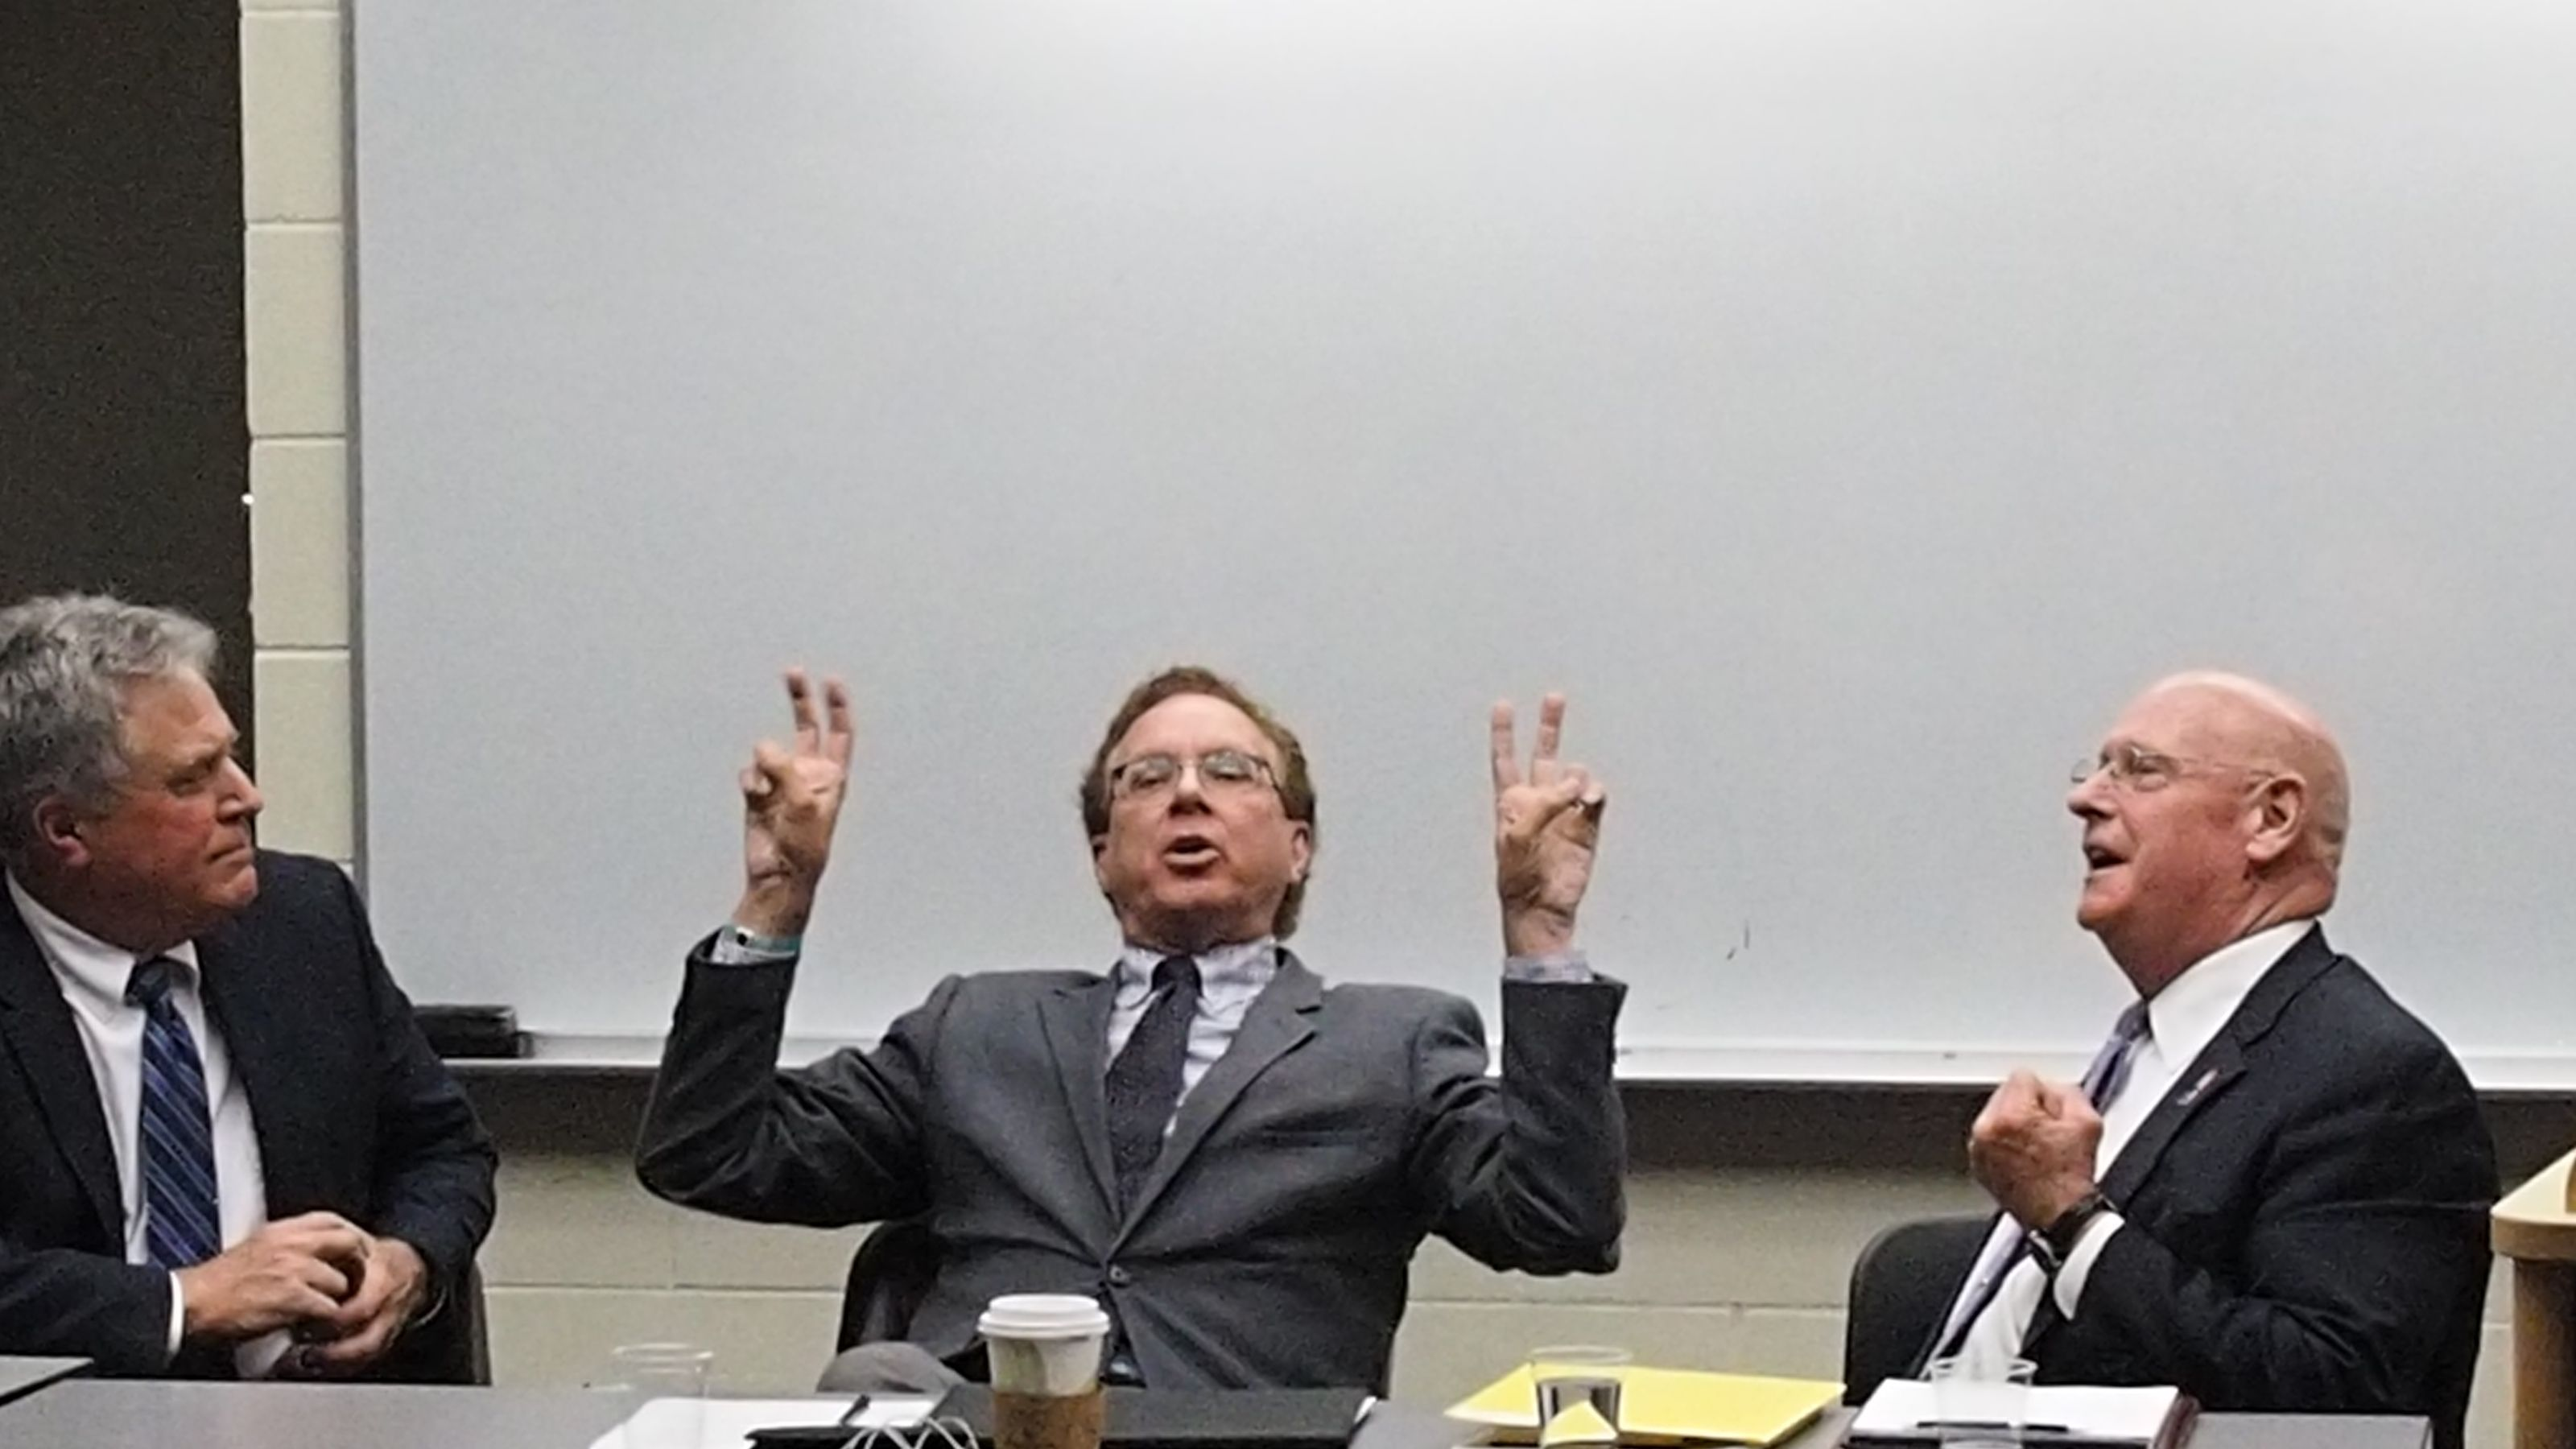 Free Speech Panel